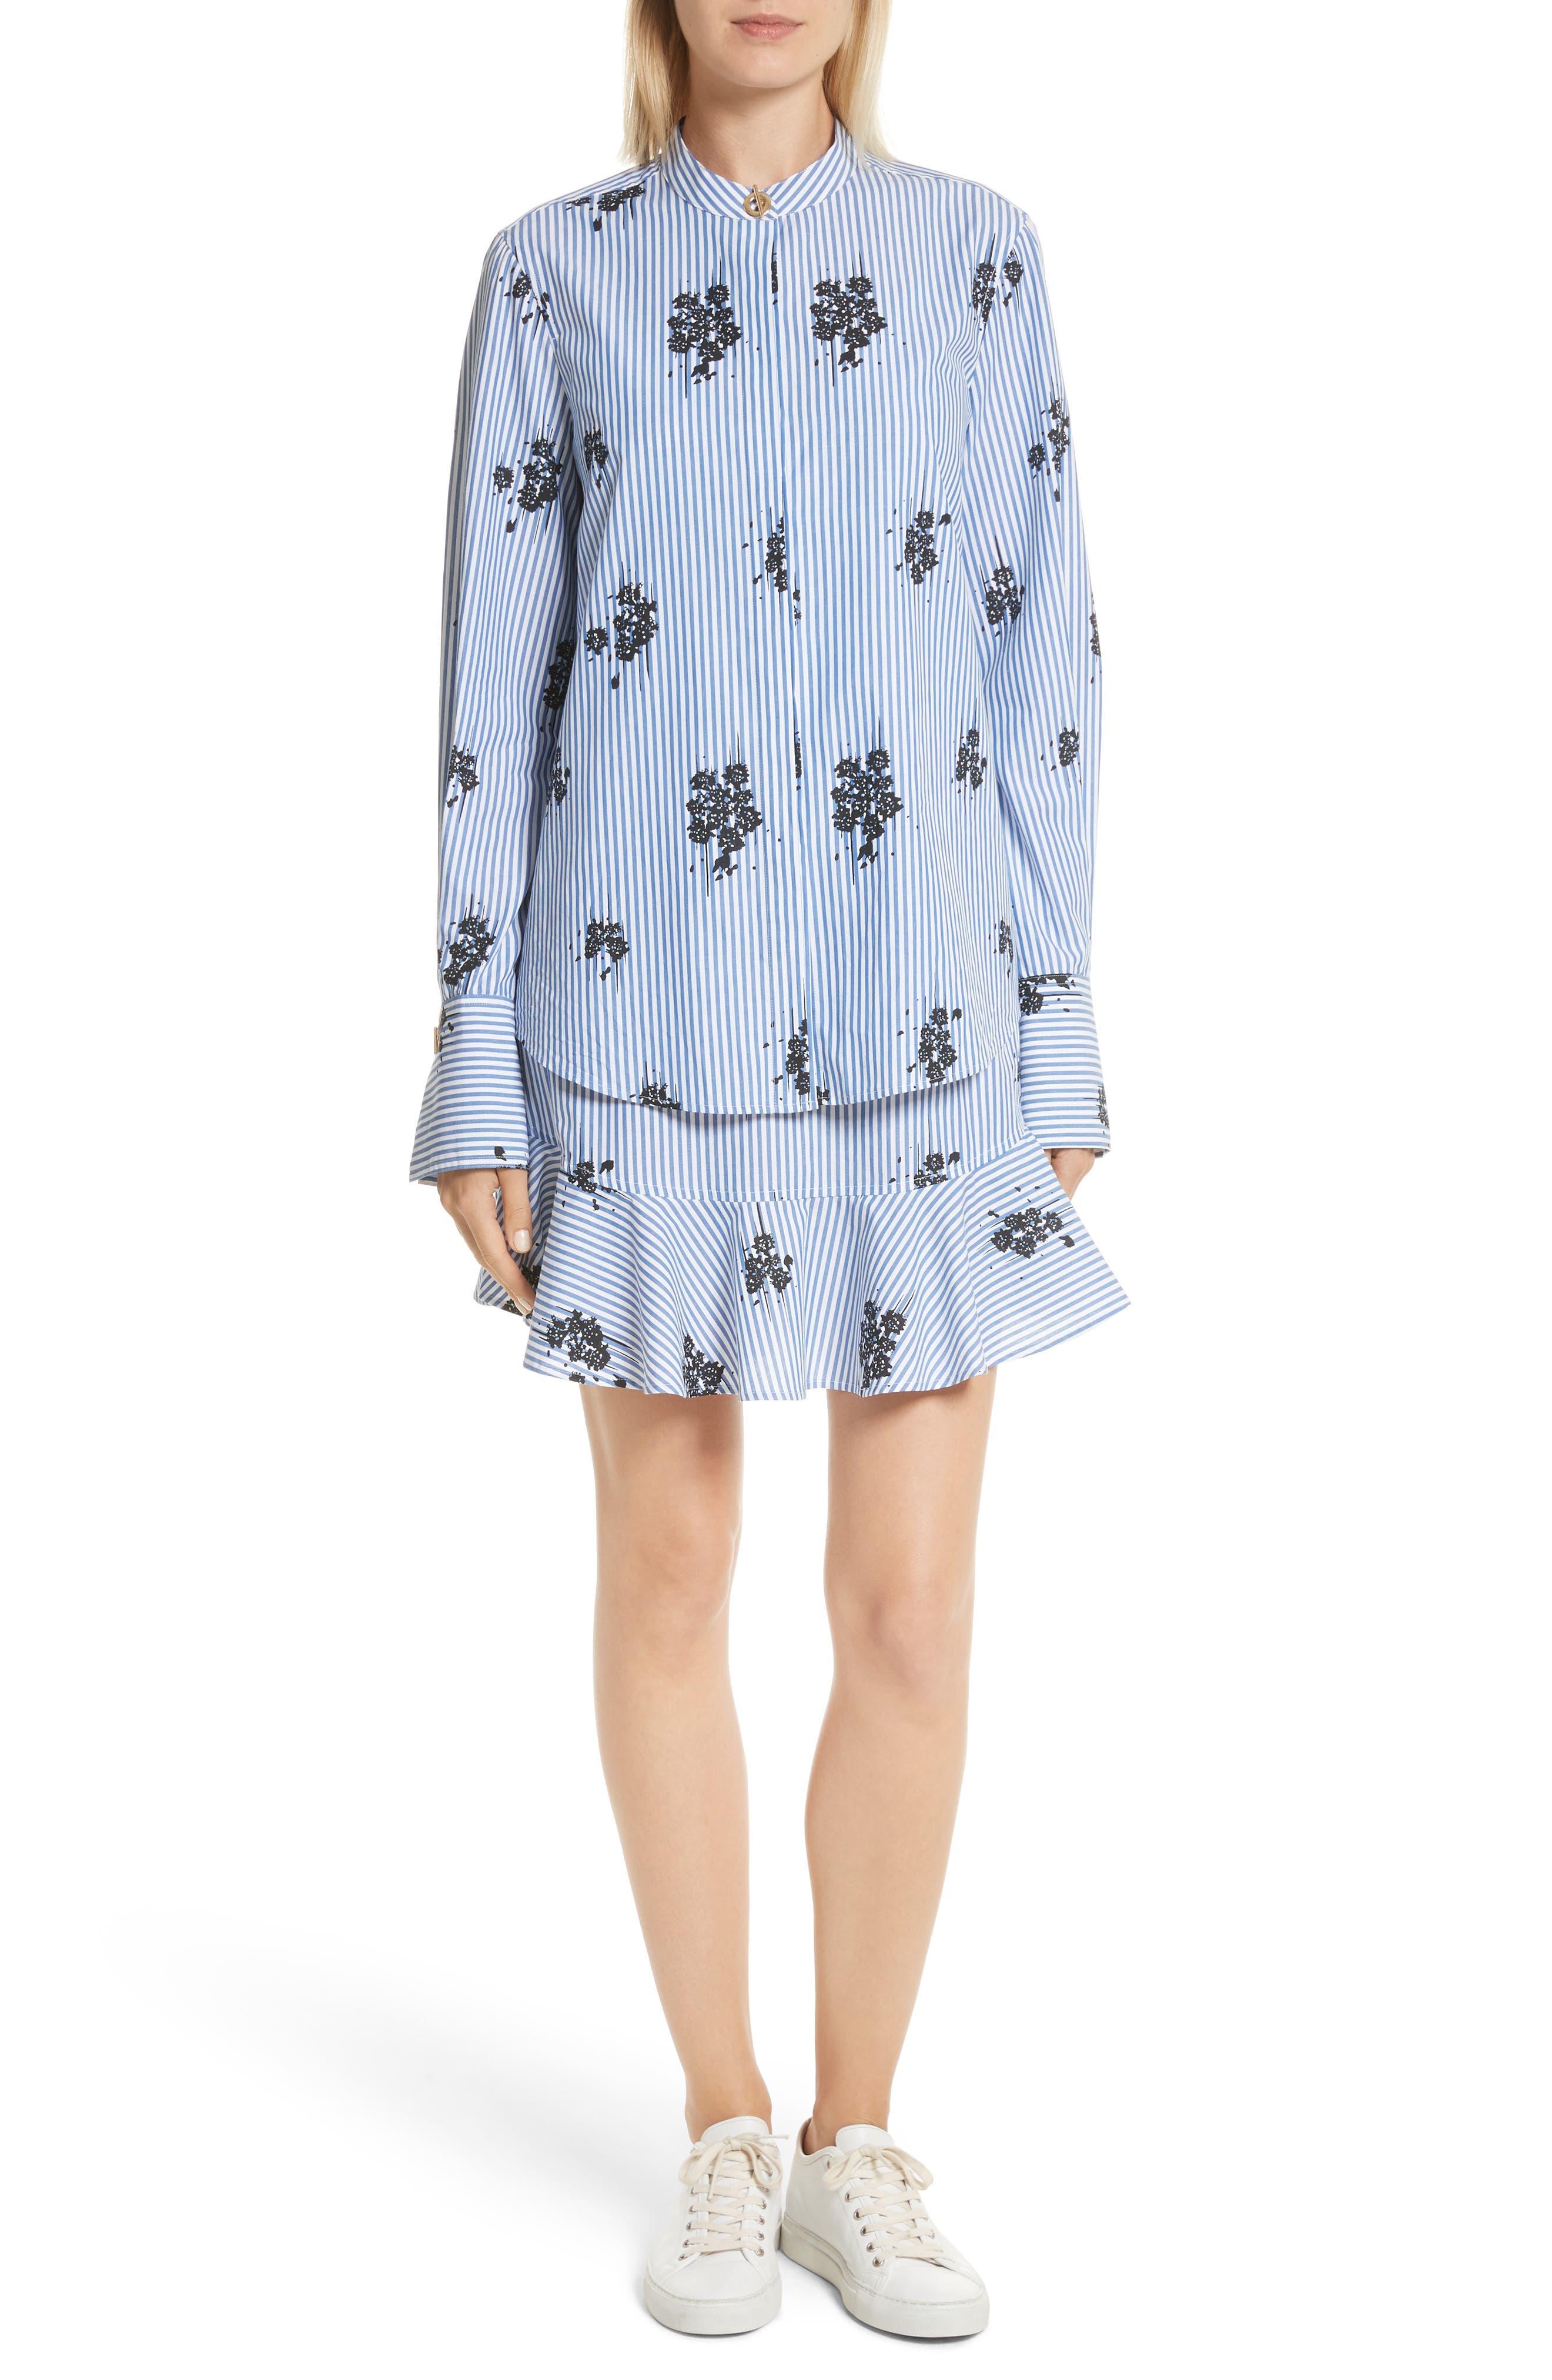 2-in-1 Ruffled Shirtdress,                             Main thumbnail 1, color,                             Blue